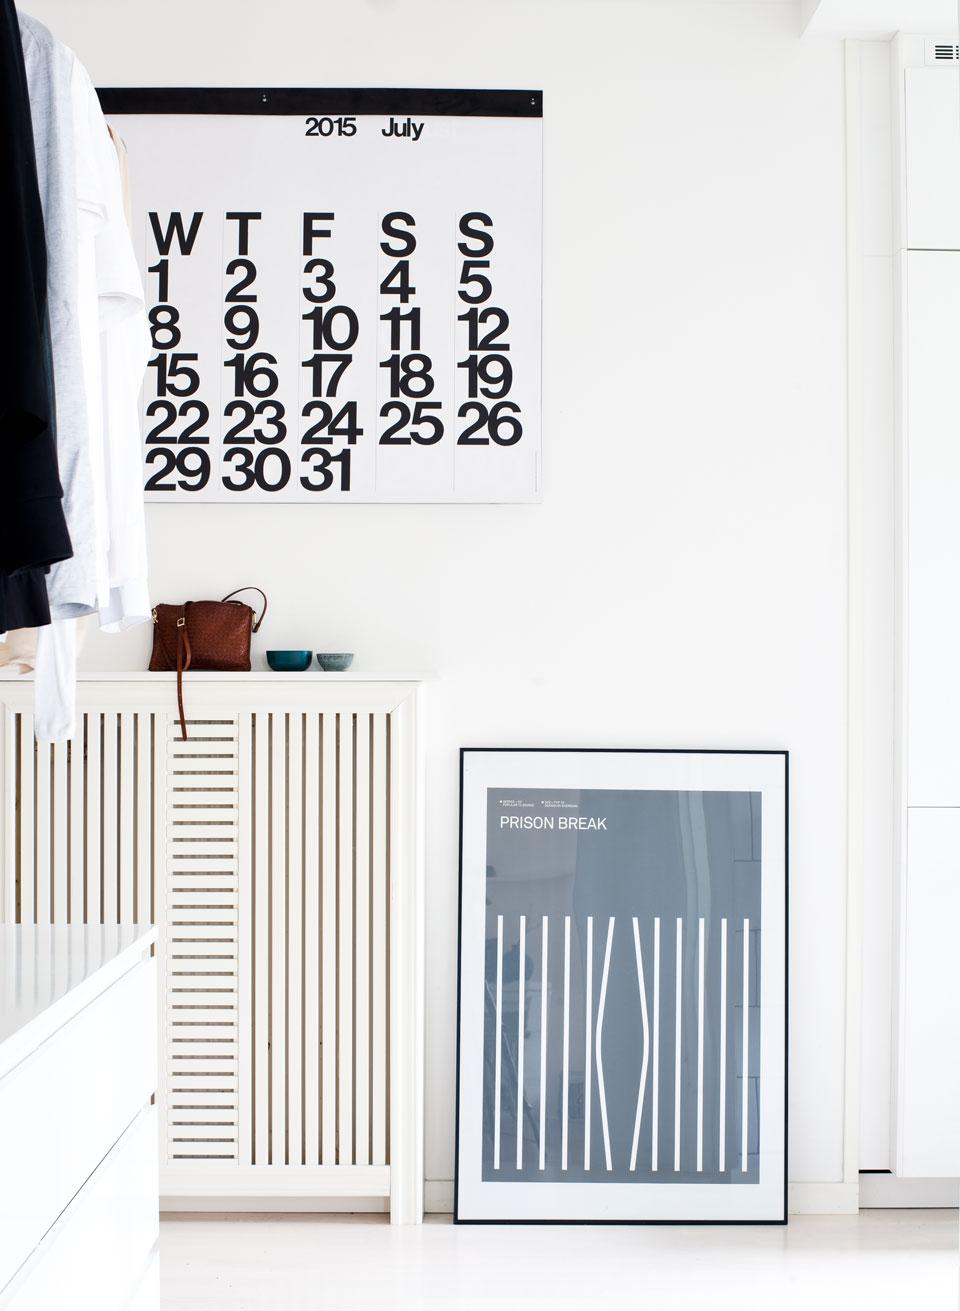 Inredning elementskydd : Utvalda/ Selected Interiors 2015 #26   Fantastic Franks blog